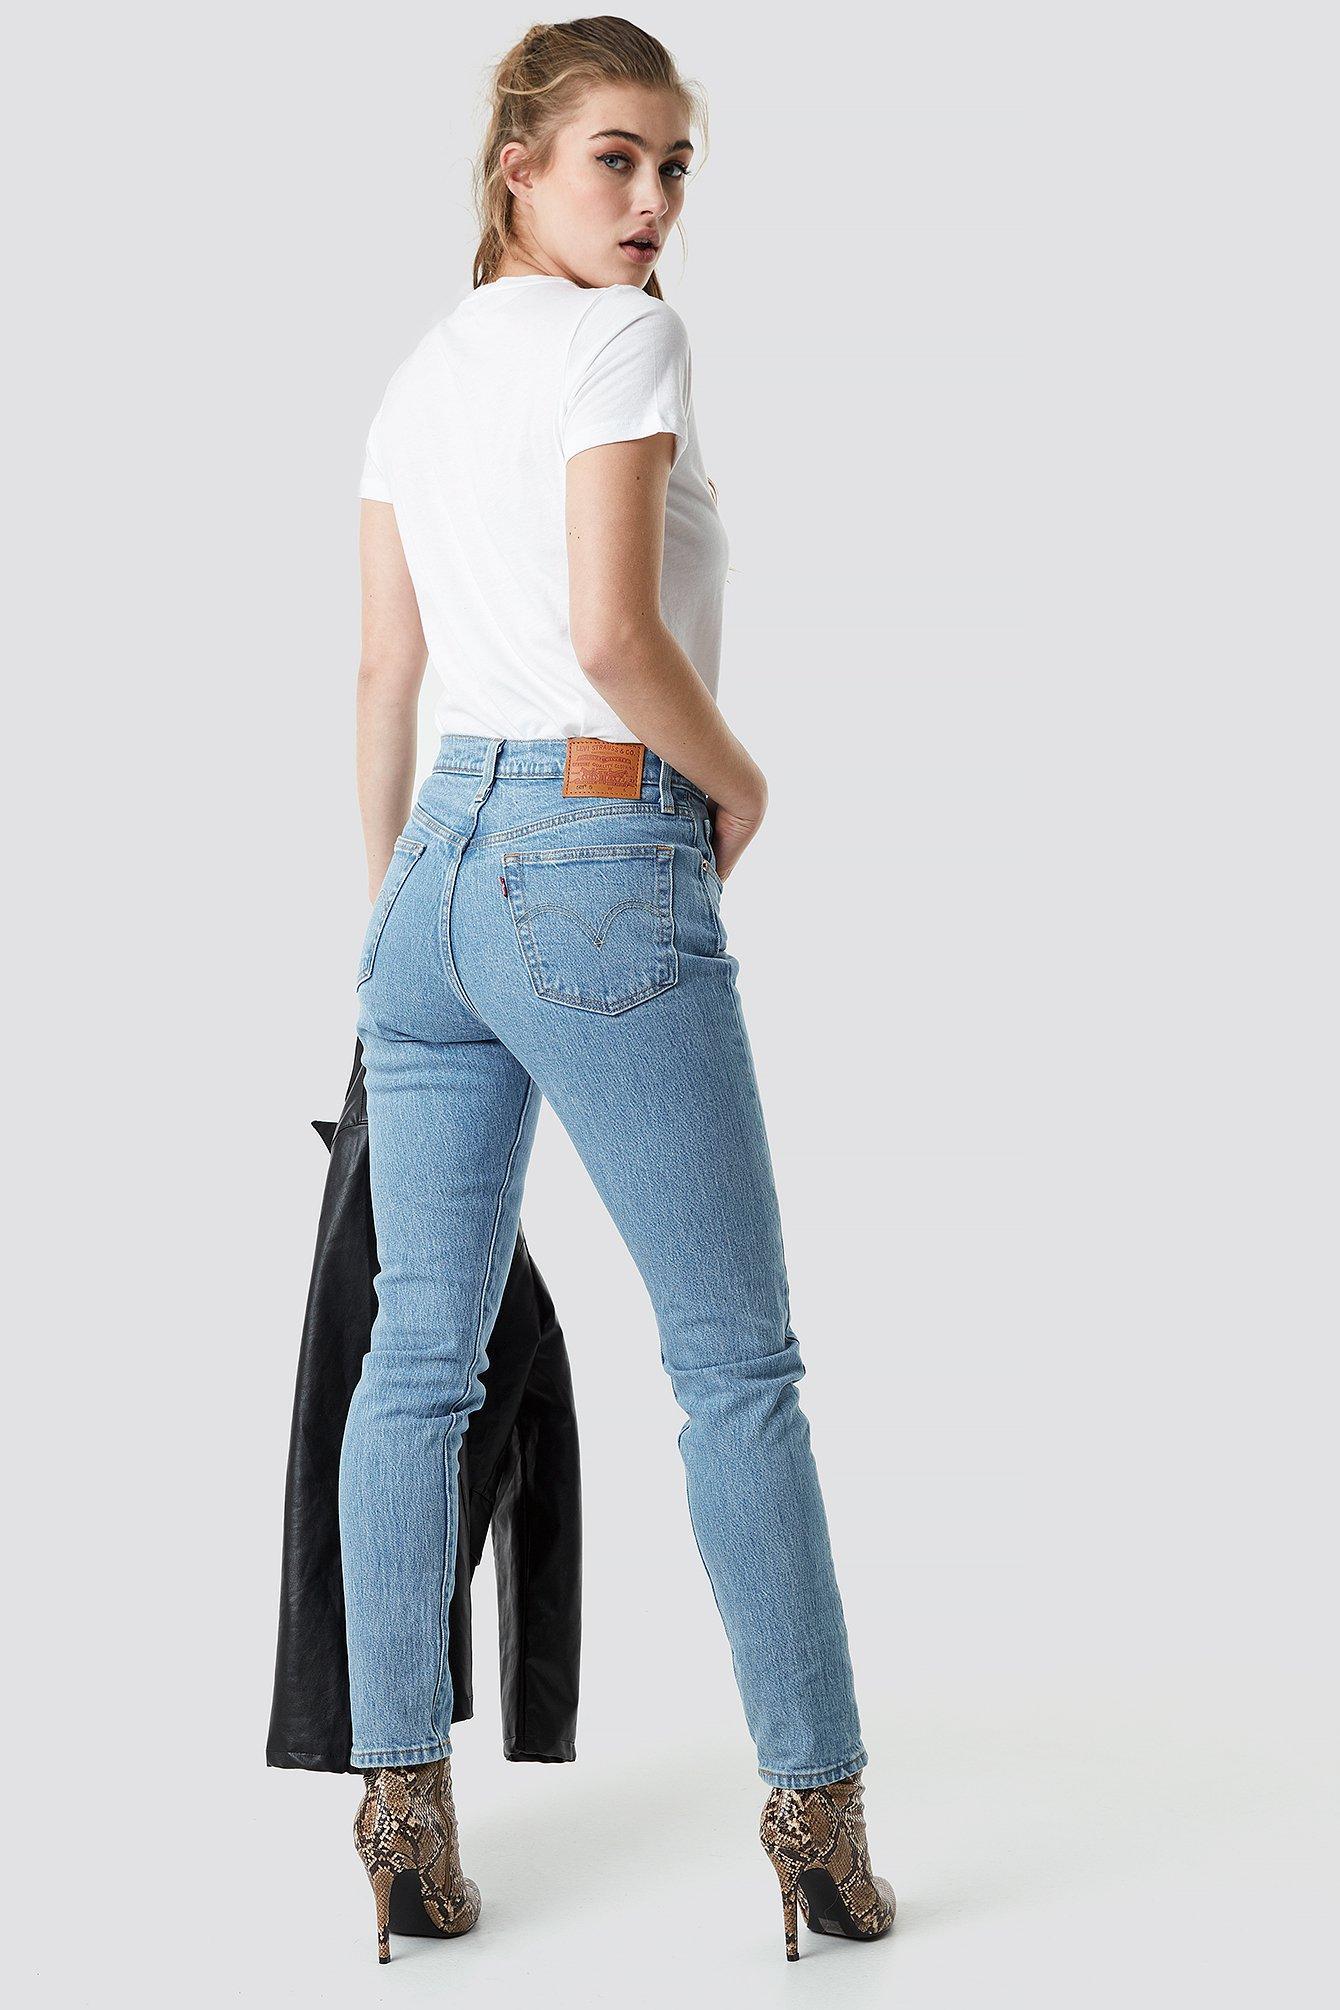 9895778e Skinny Lyst Levi's In Blue 501 Jeans cRq4j35AL